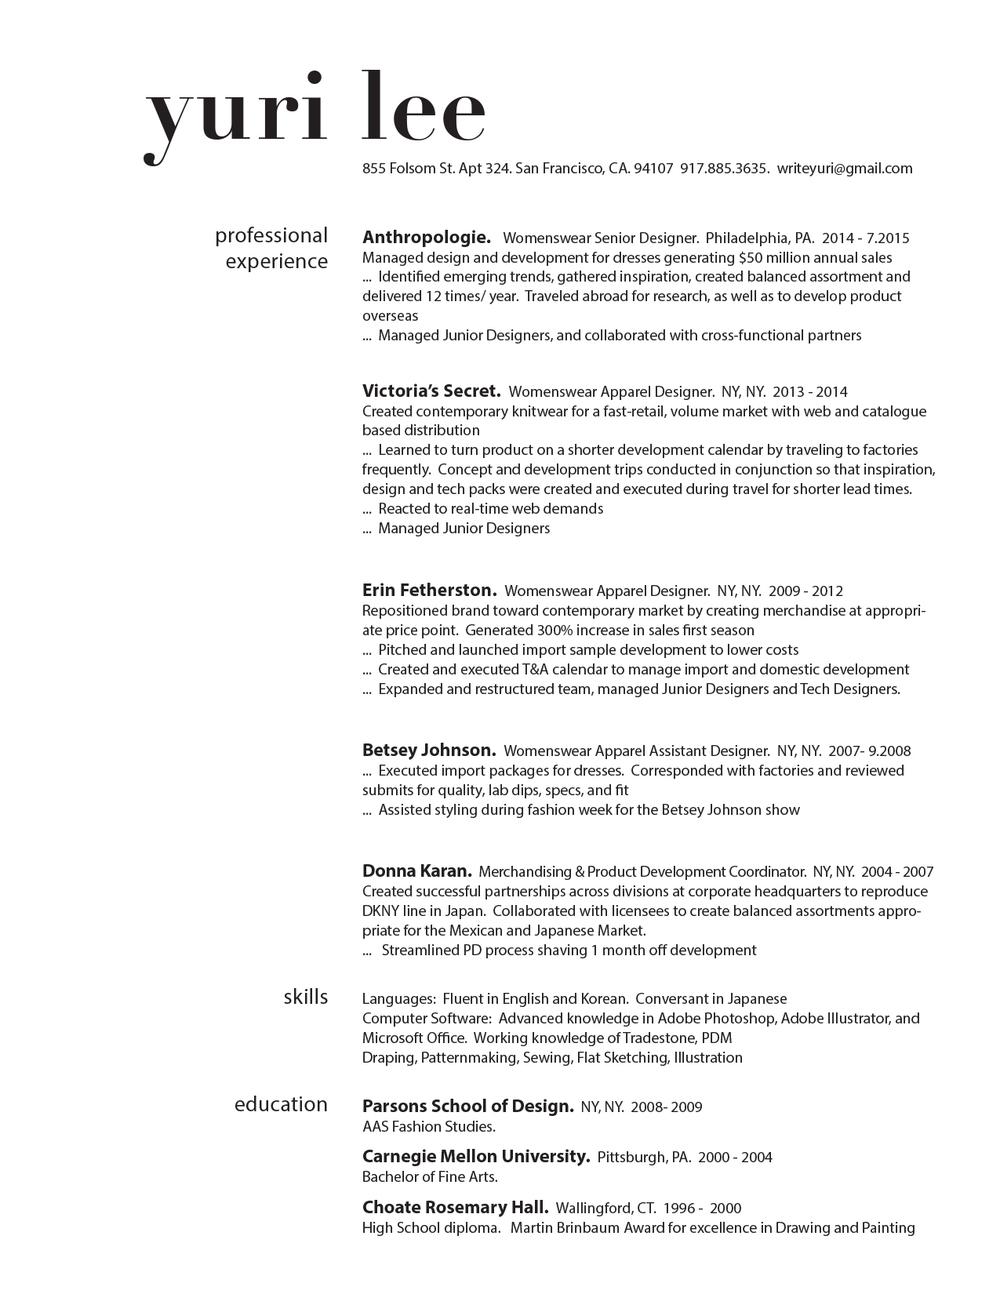 resume yuri lee design work middot about middot resume